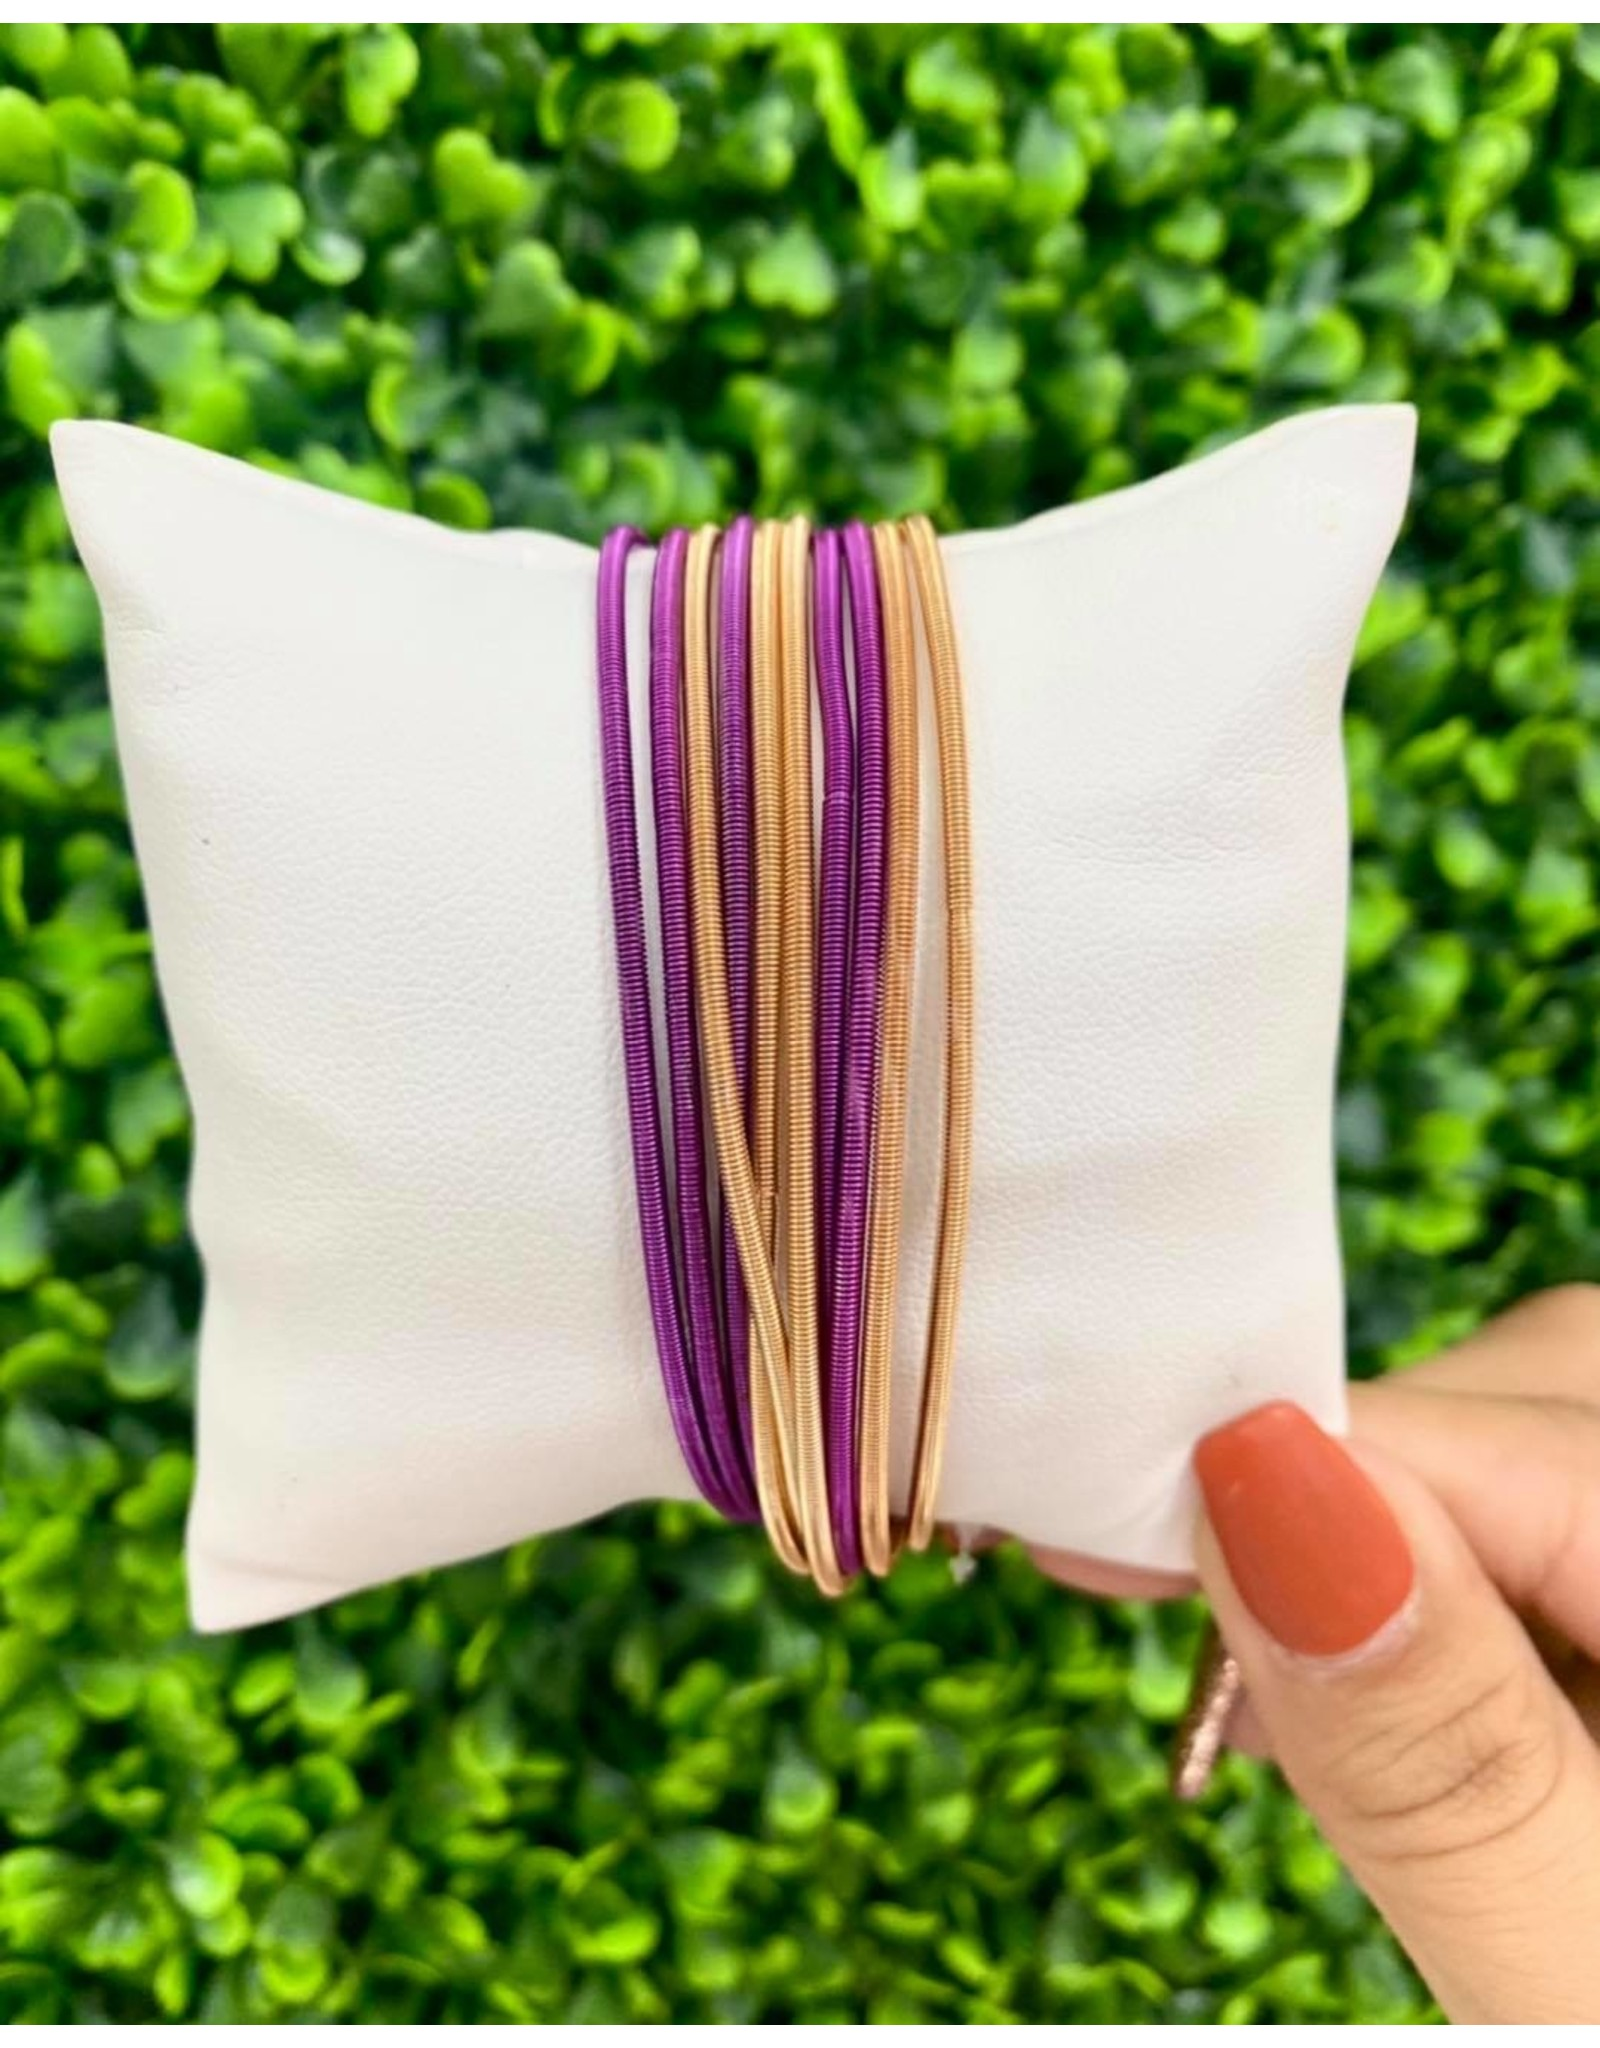 Purple/Gold Mix Guitar String Bracelets - Set of 10